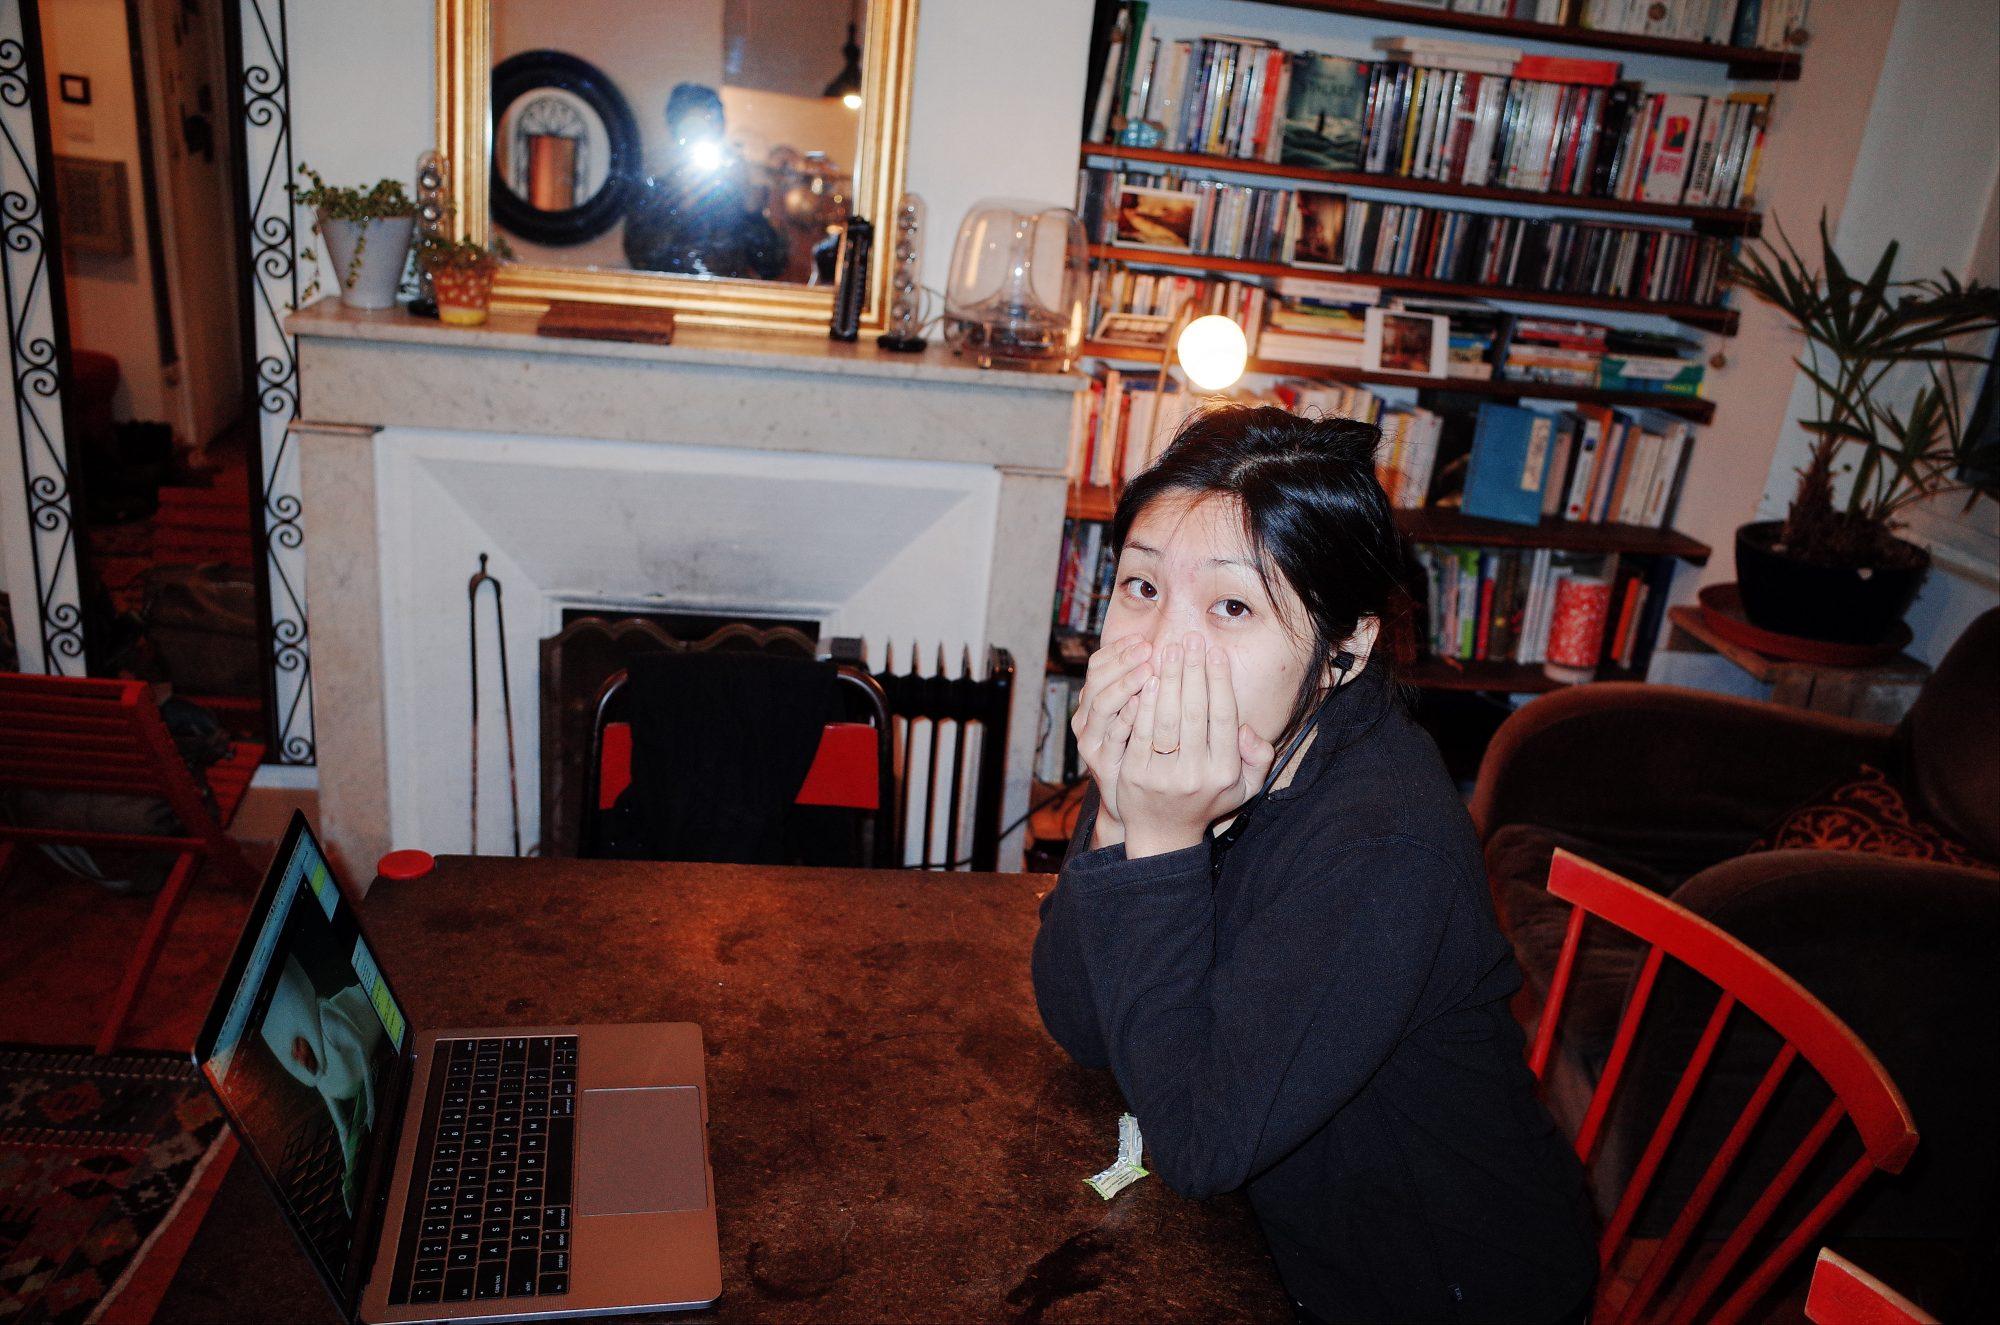 Cindy watching her show. Marseille, 2017